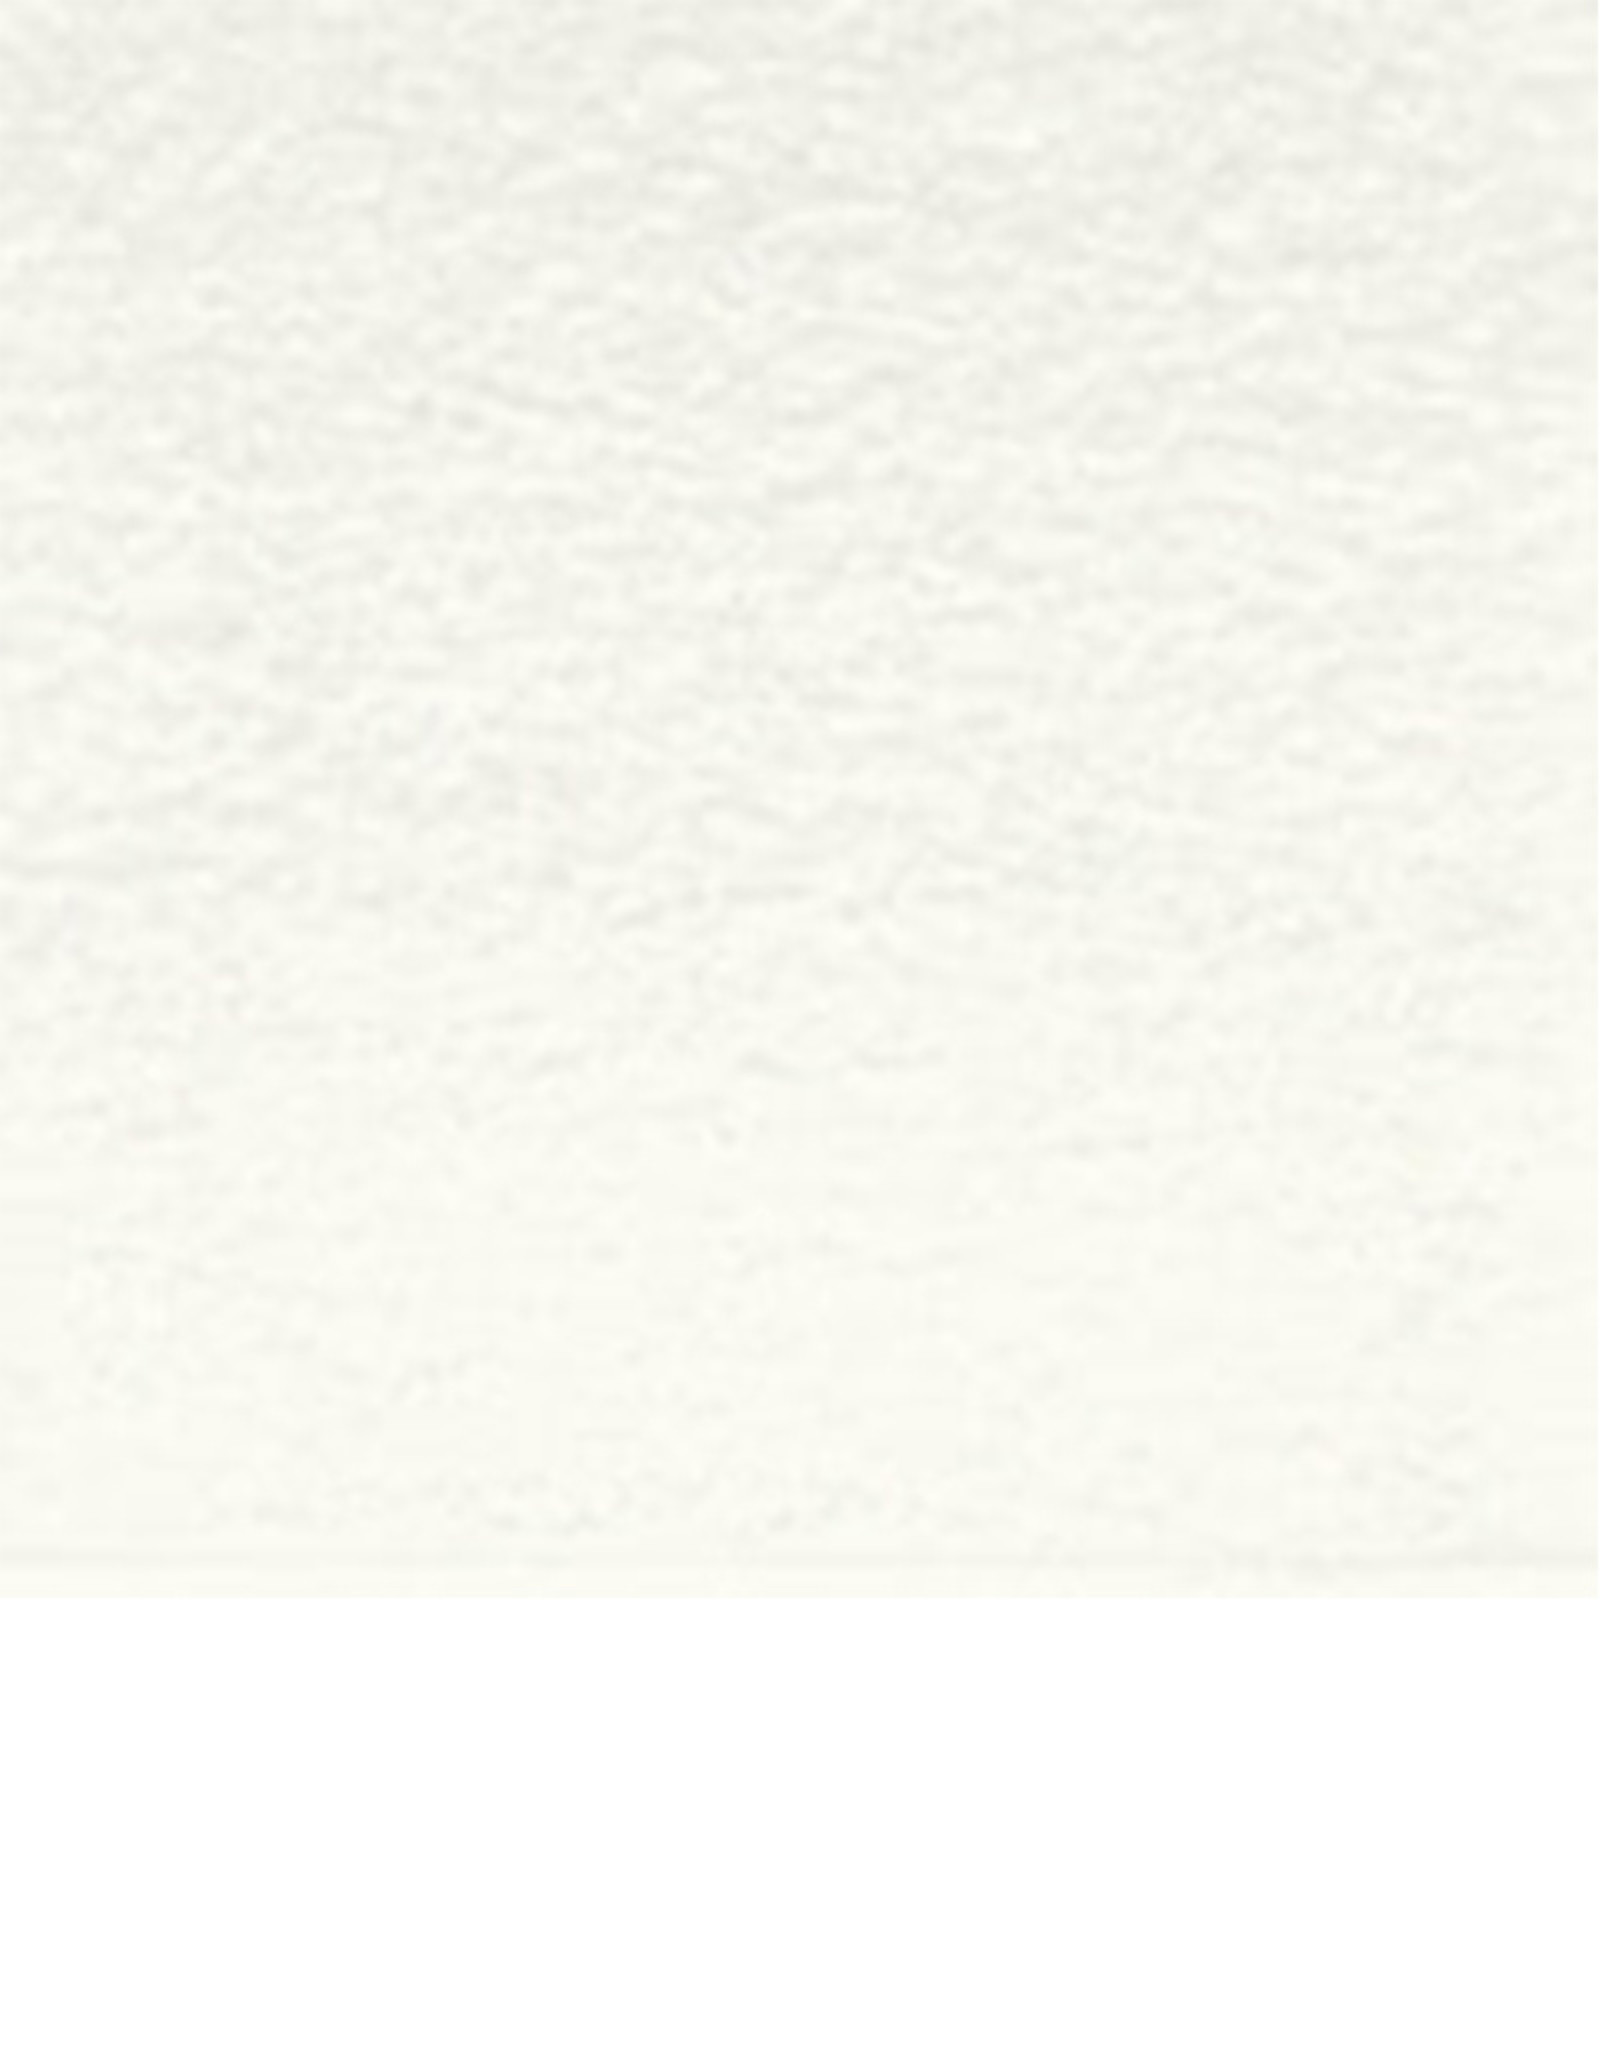 Inktense Potlood Antique White